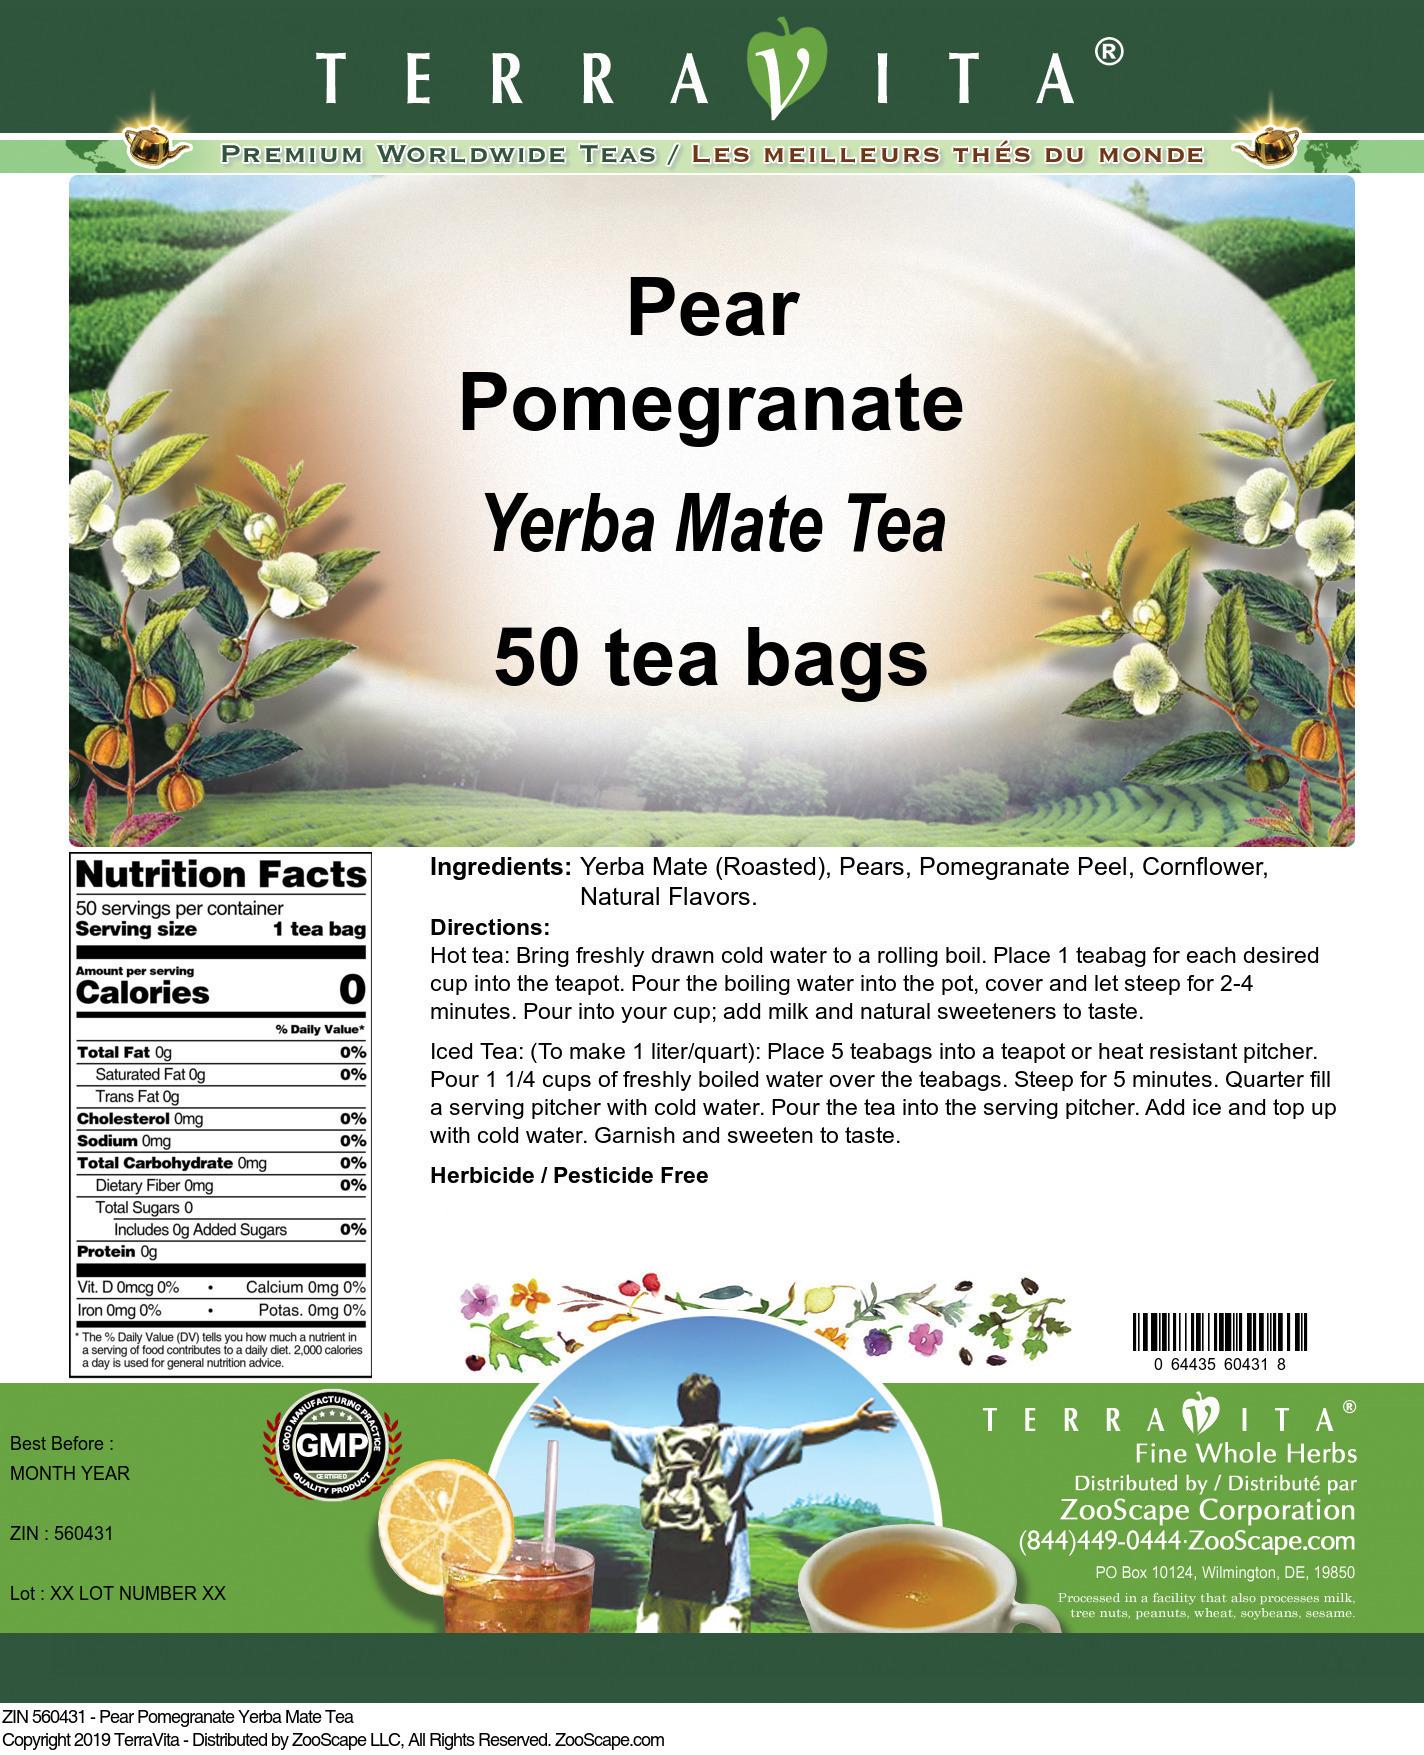 Pear Pomegranate Yerba Mate Tea